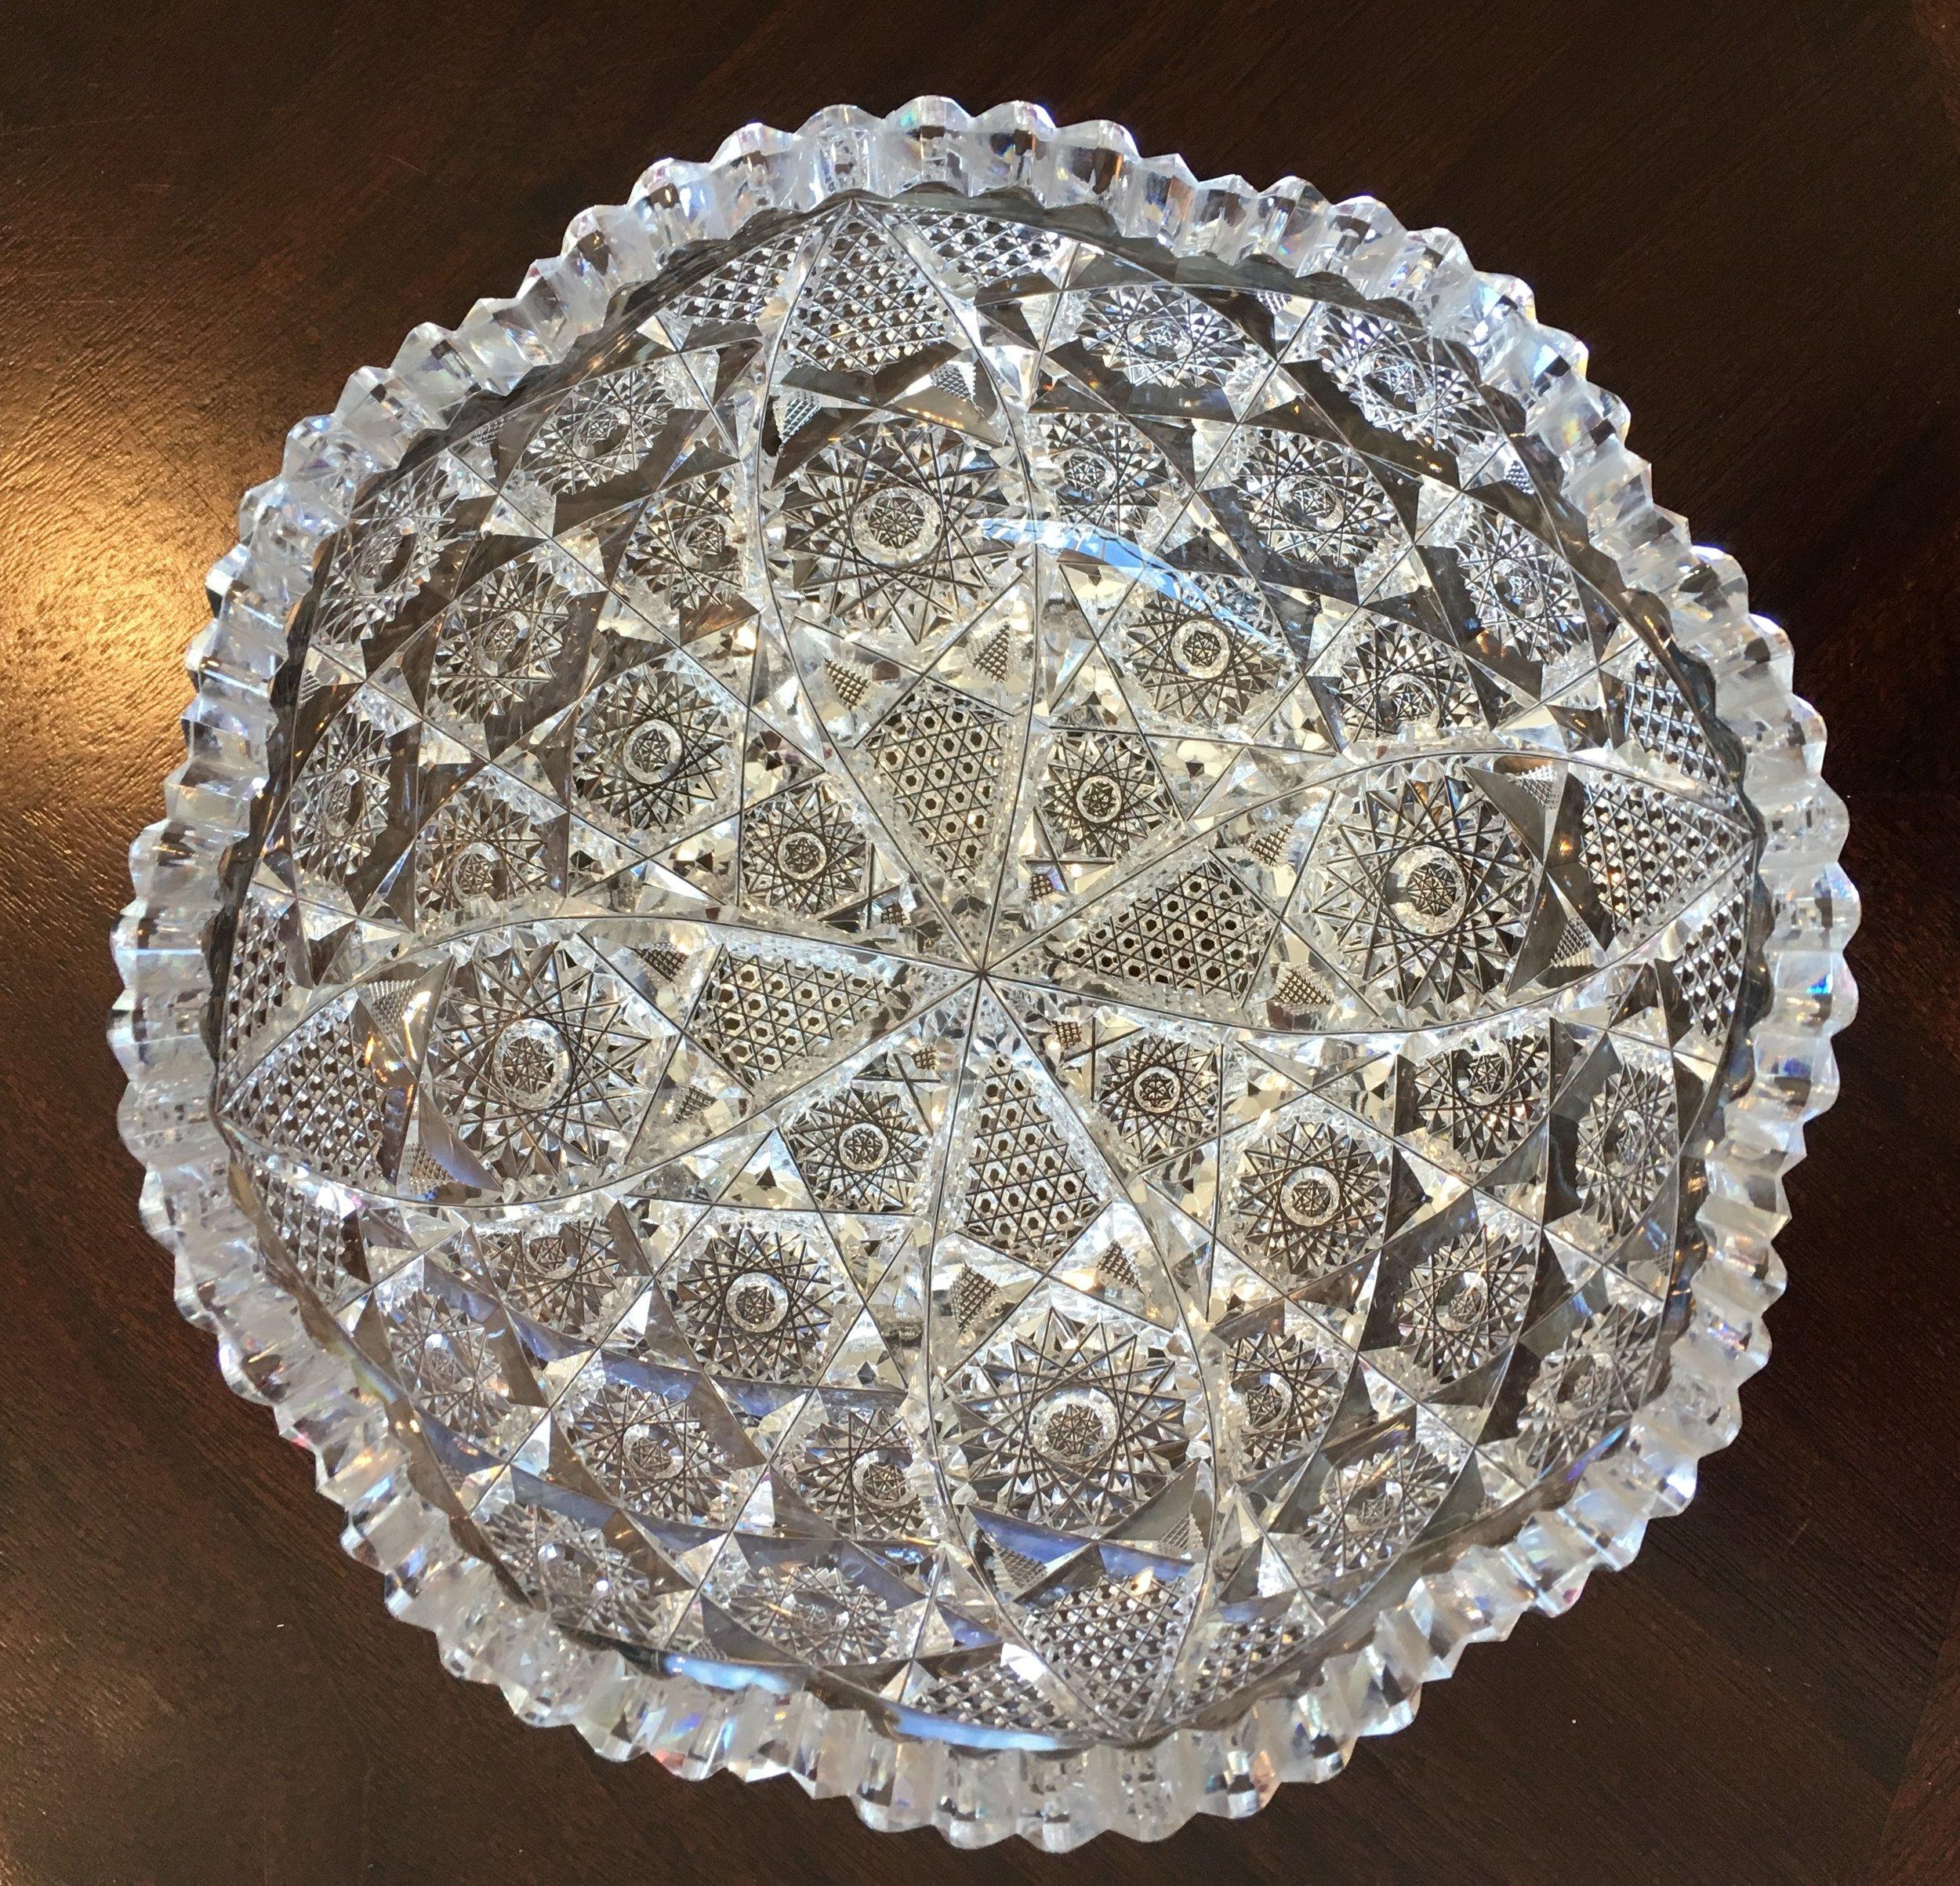 CutGlass.bowl.Cluster.jpg